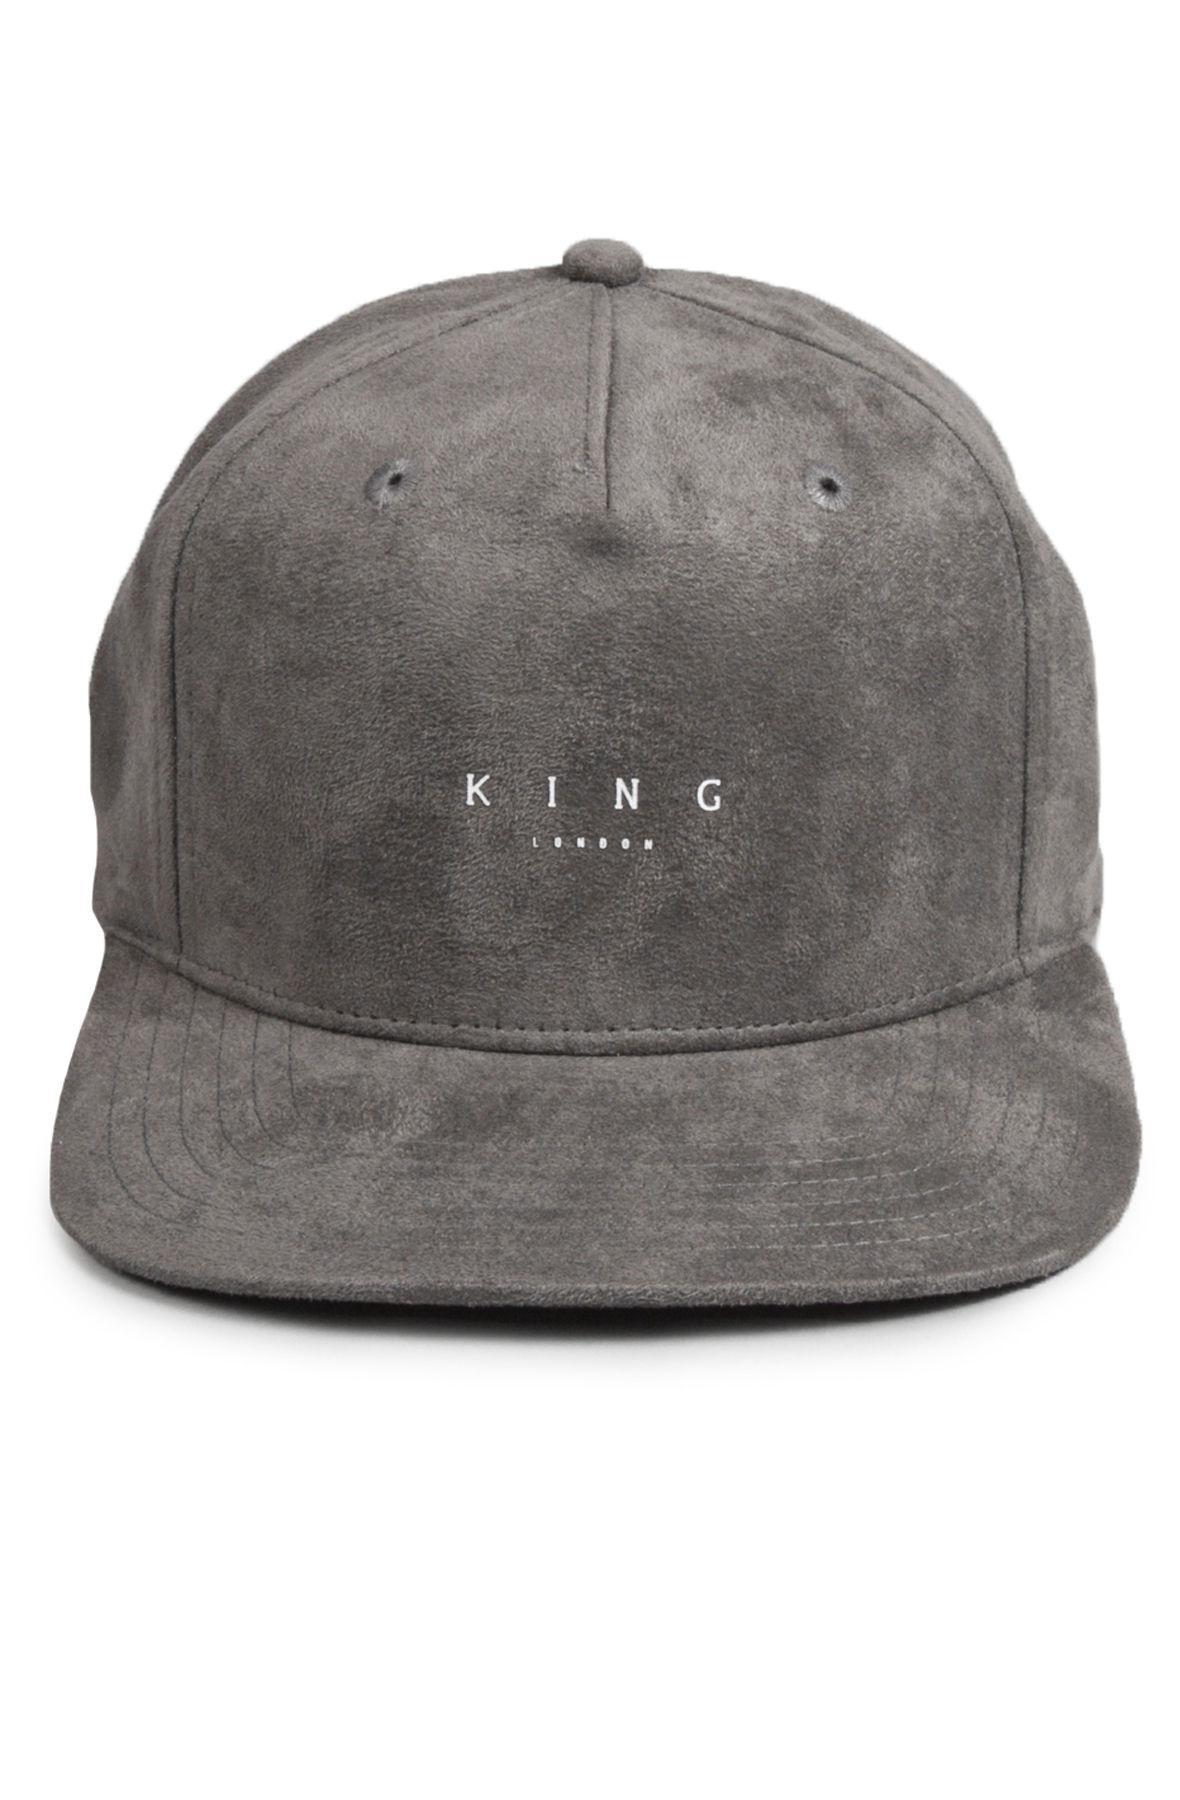 82e4bfc89c9 Lyst - KING LONDON Stepney Snapback Stone in Gray for Men